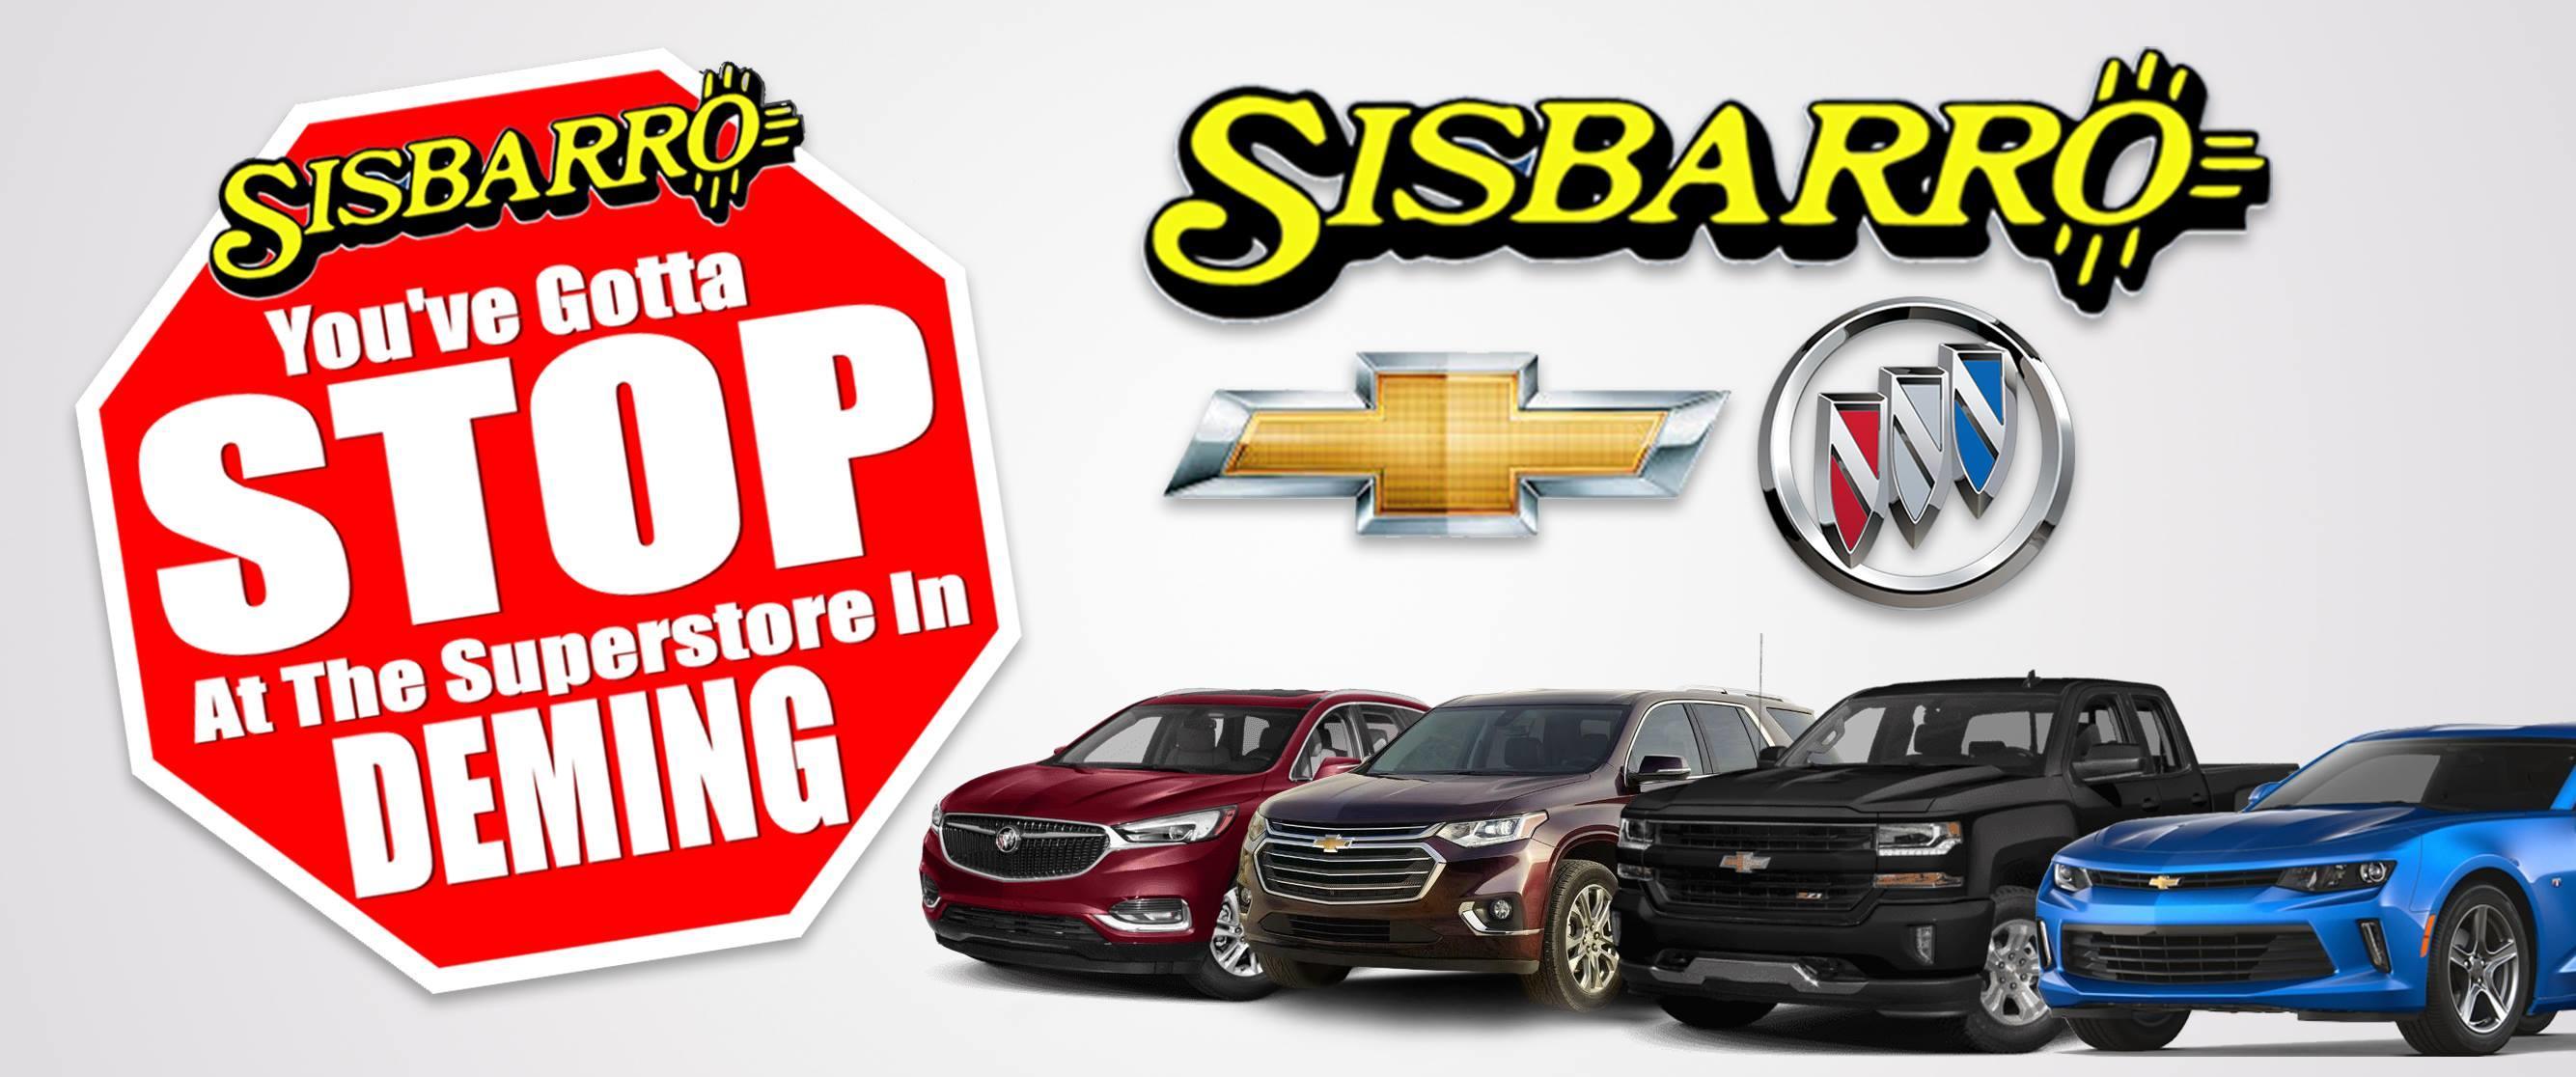 Sisbarro Chevrolet Buick image 5